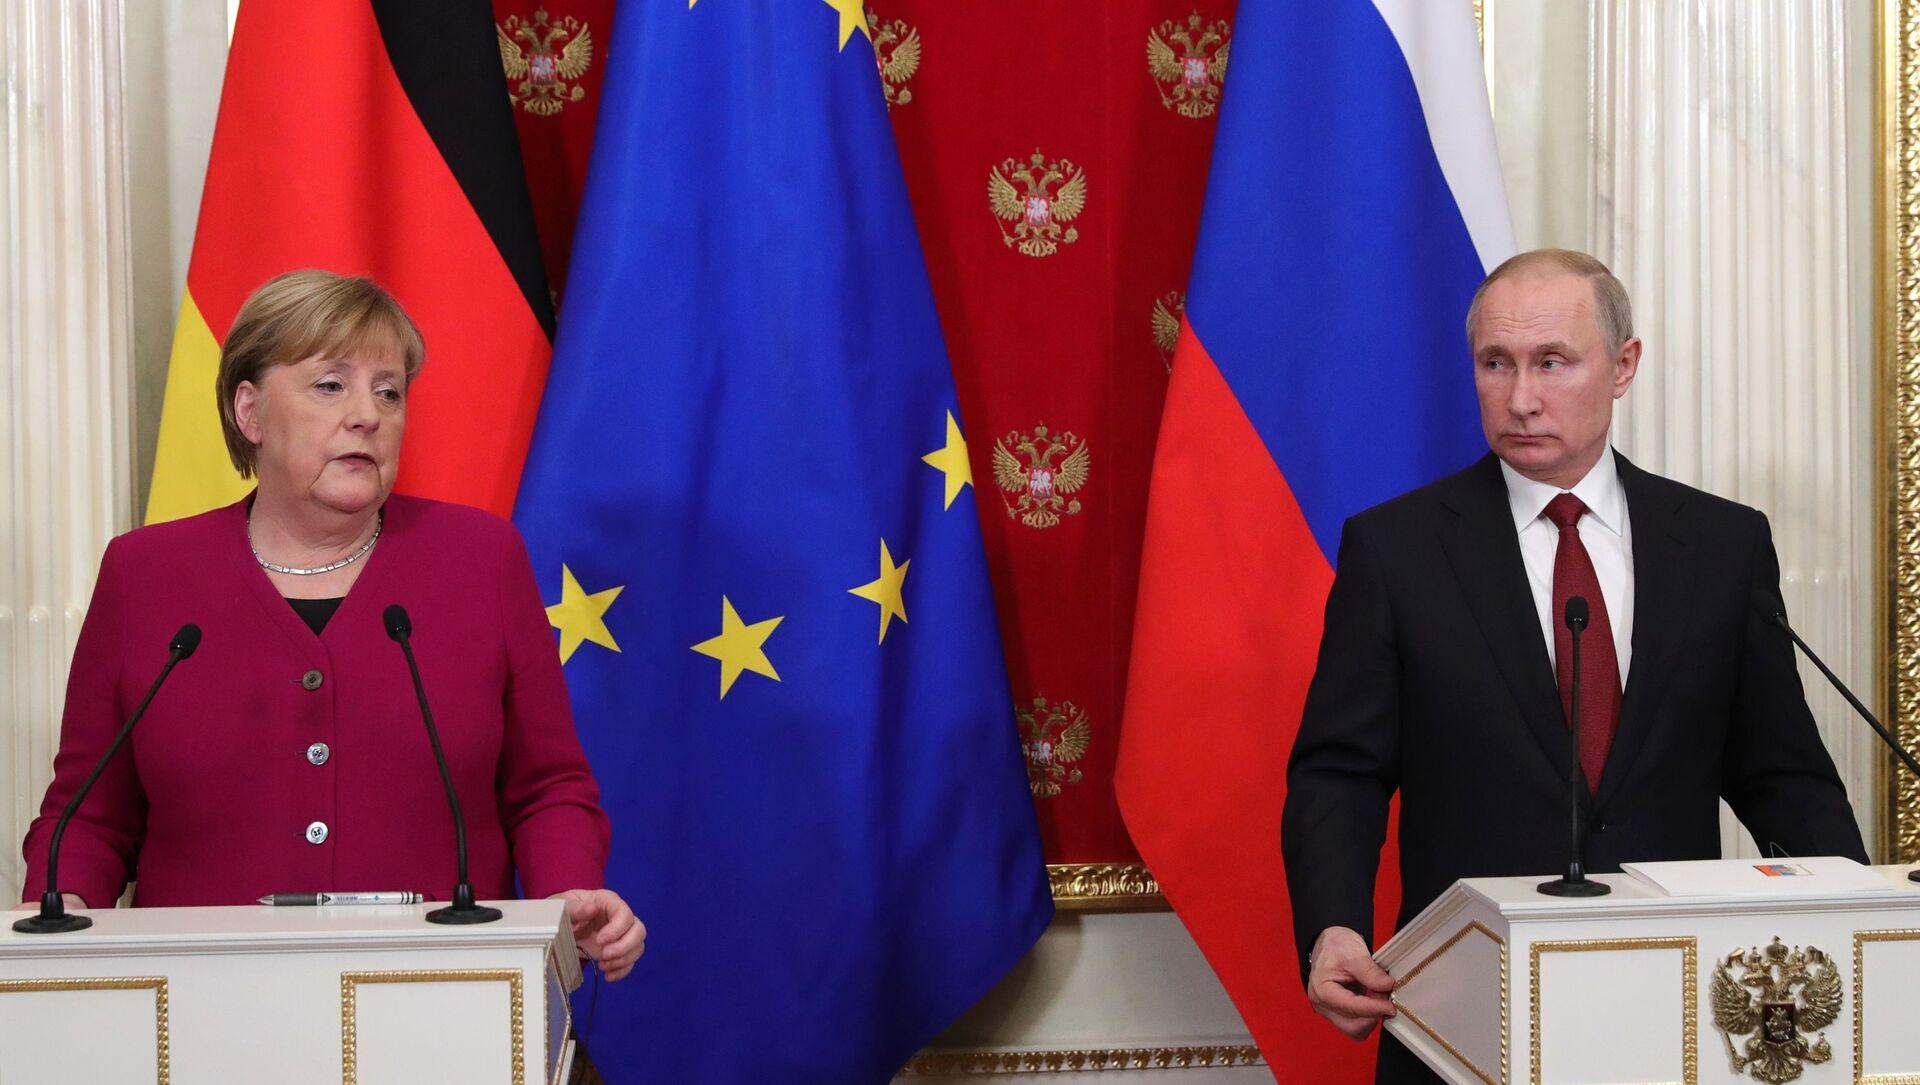 German Chancellor Angela Merkel and Russian President Vladimir Putin speak at a press conference at the Kremlin on Saturday, 11 January 2020 - Sputnik International, 1920, 30.07.2021